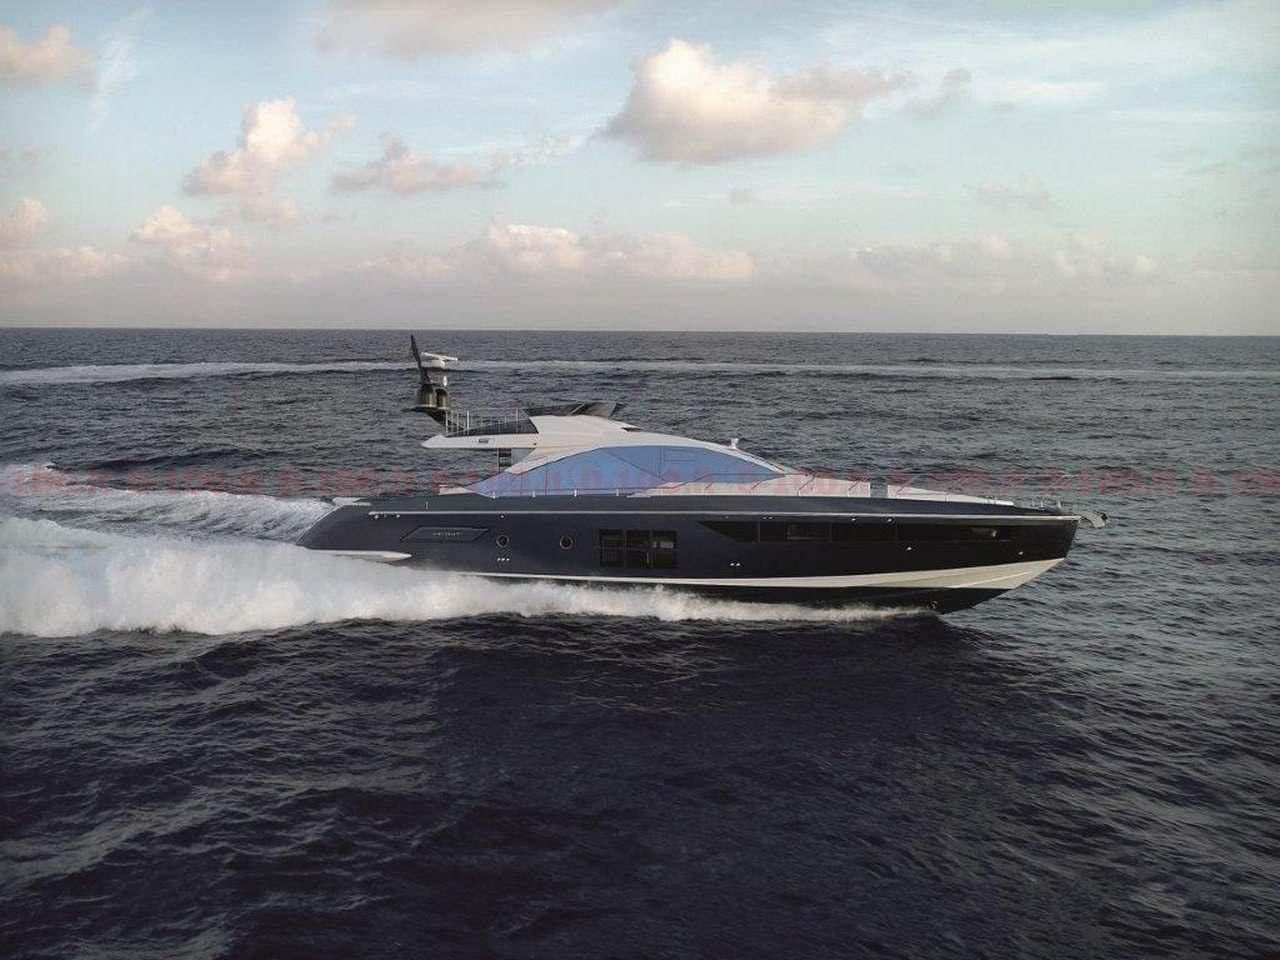 azimut-yachts-anteprime-mondiali-al-cannes-yachting-festival-2017_0-1002